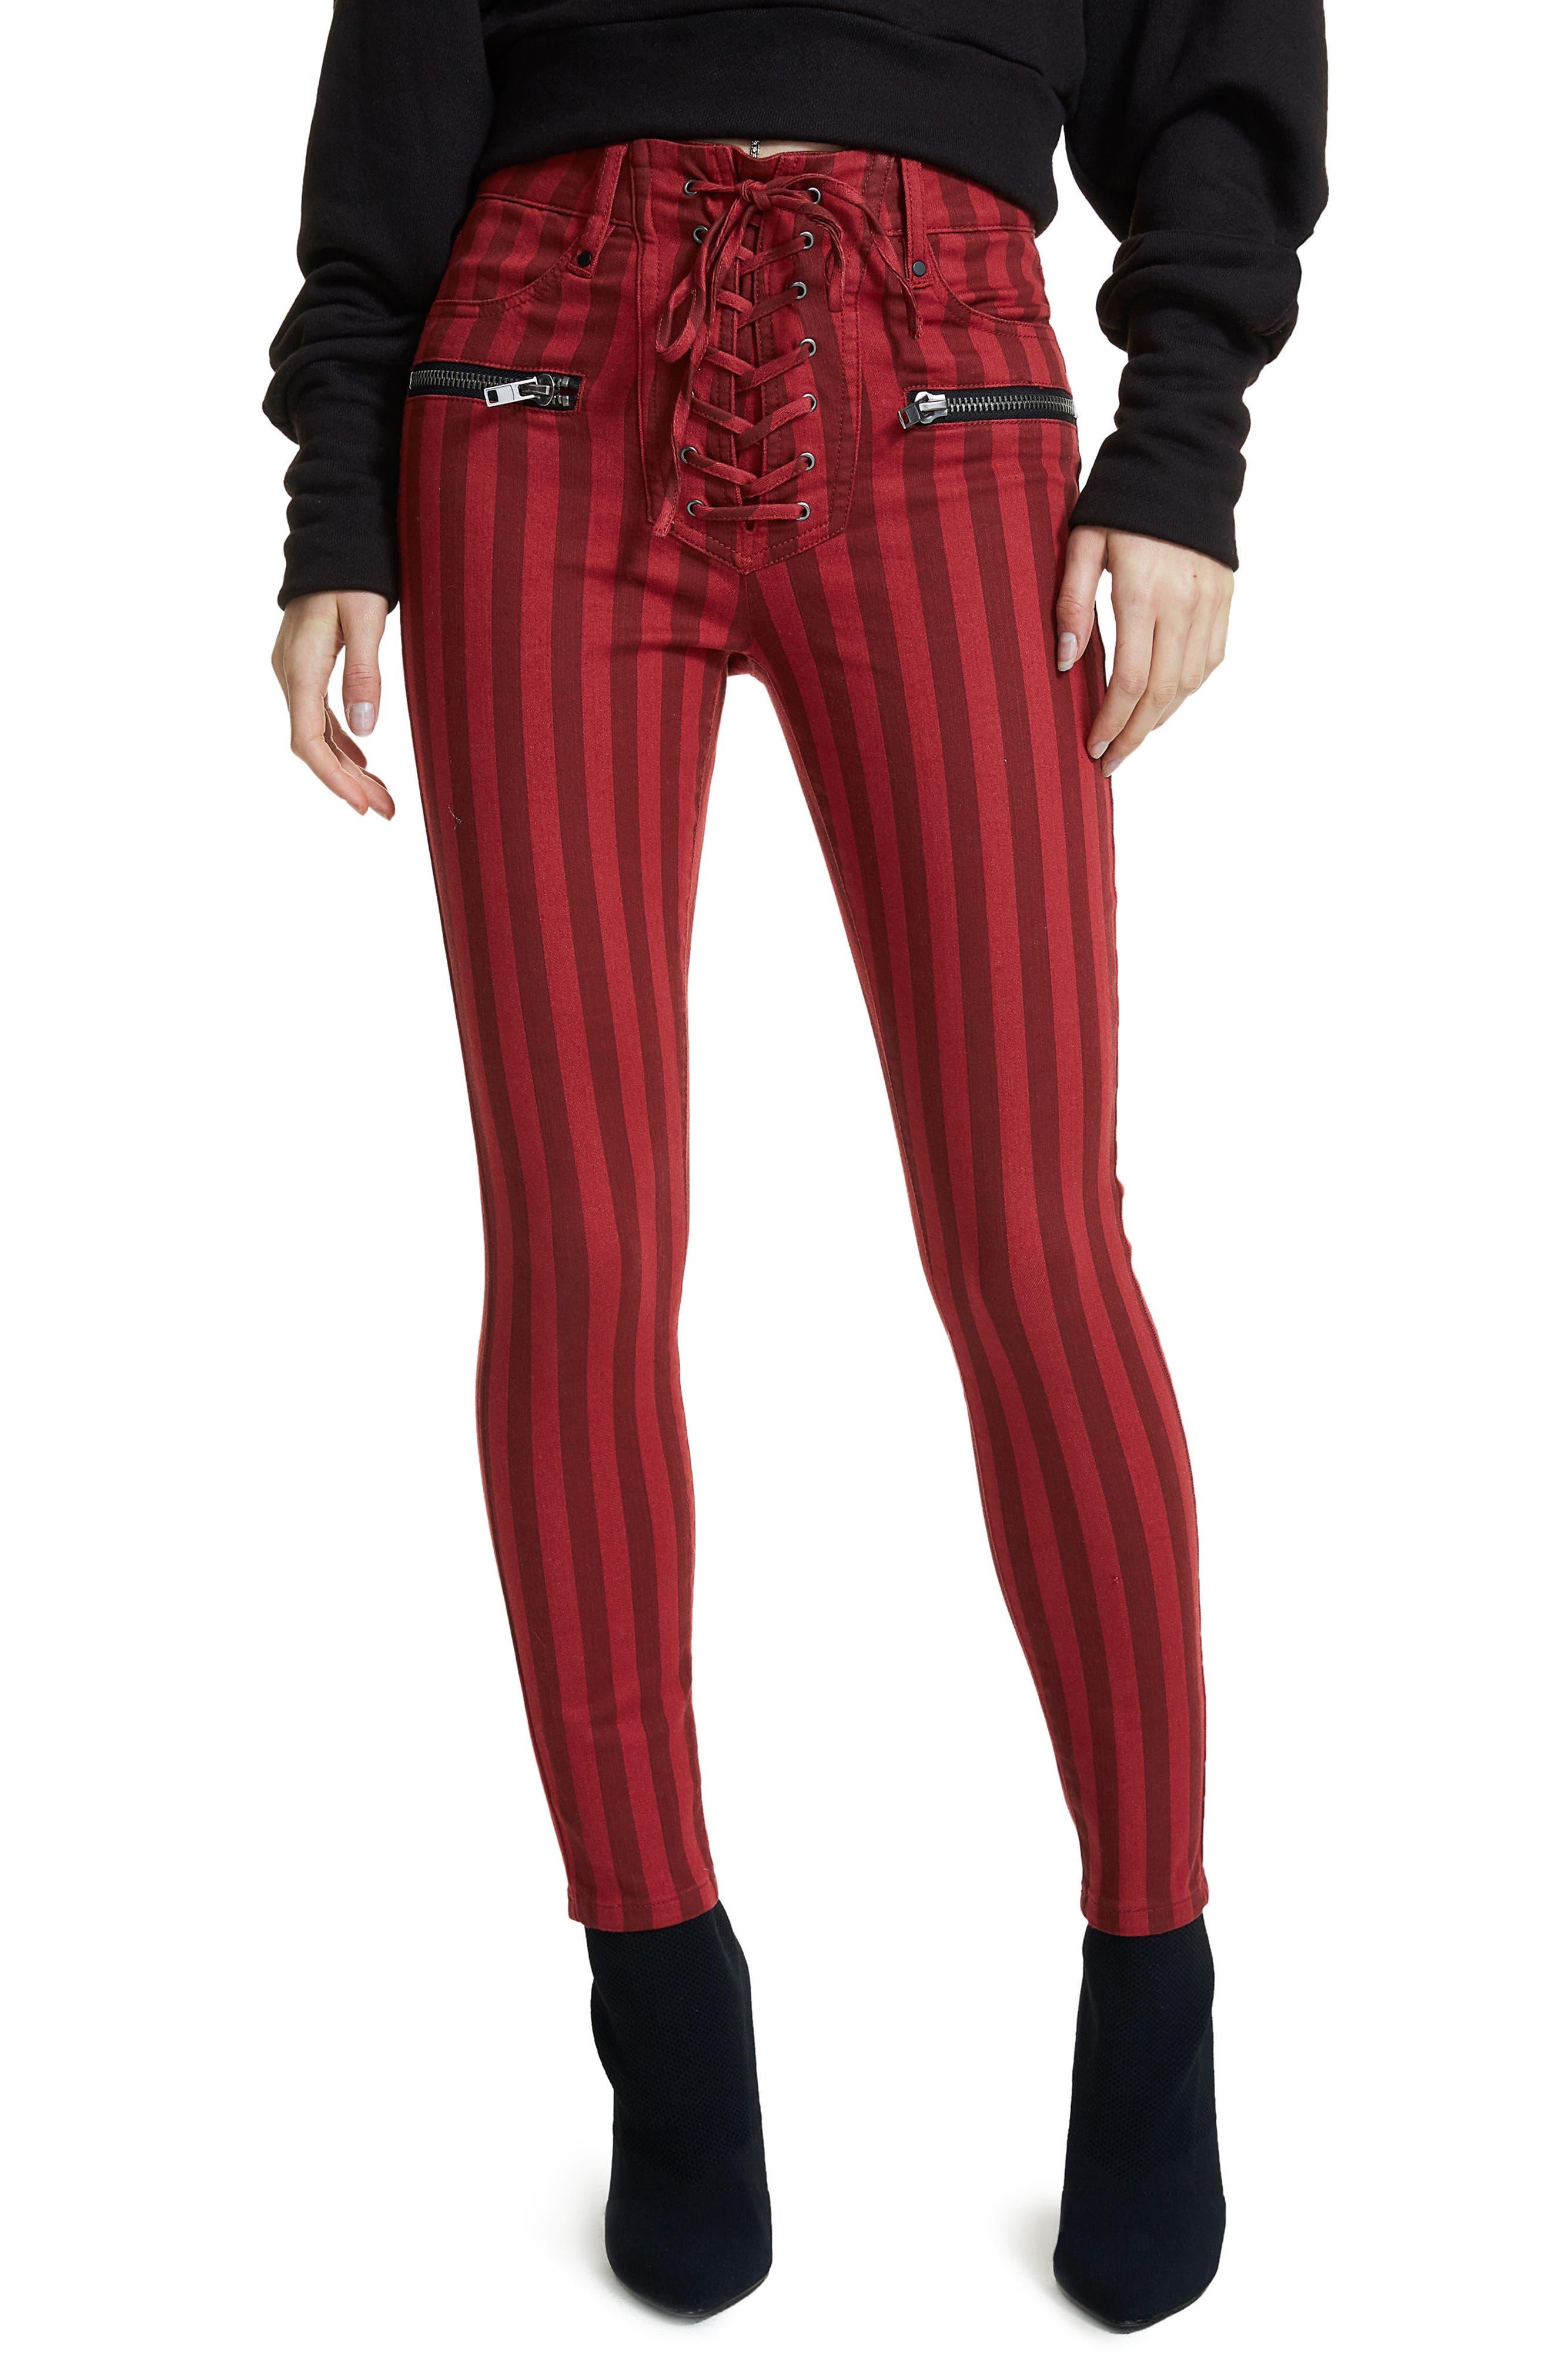 Alden Lace-Up Skinny Jeans,                             Main thumbnail 2, color,